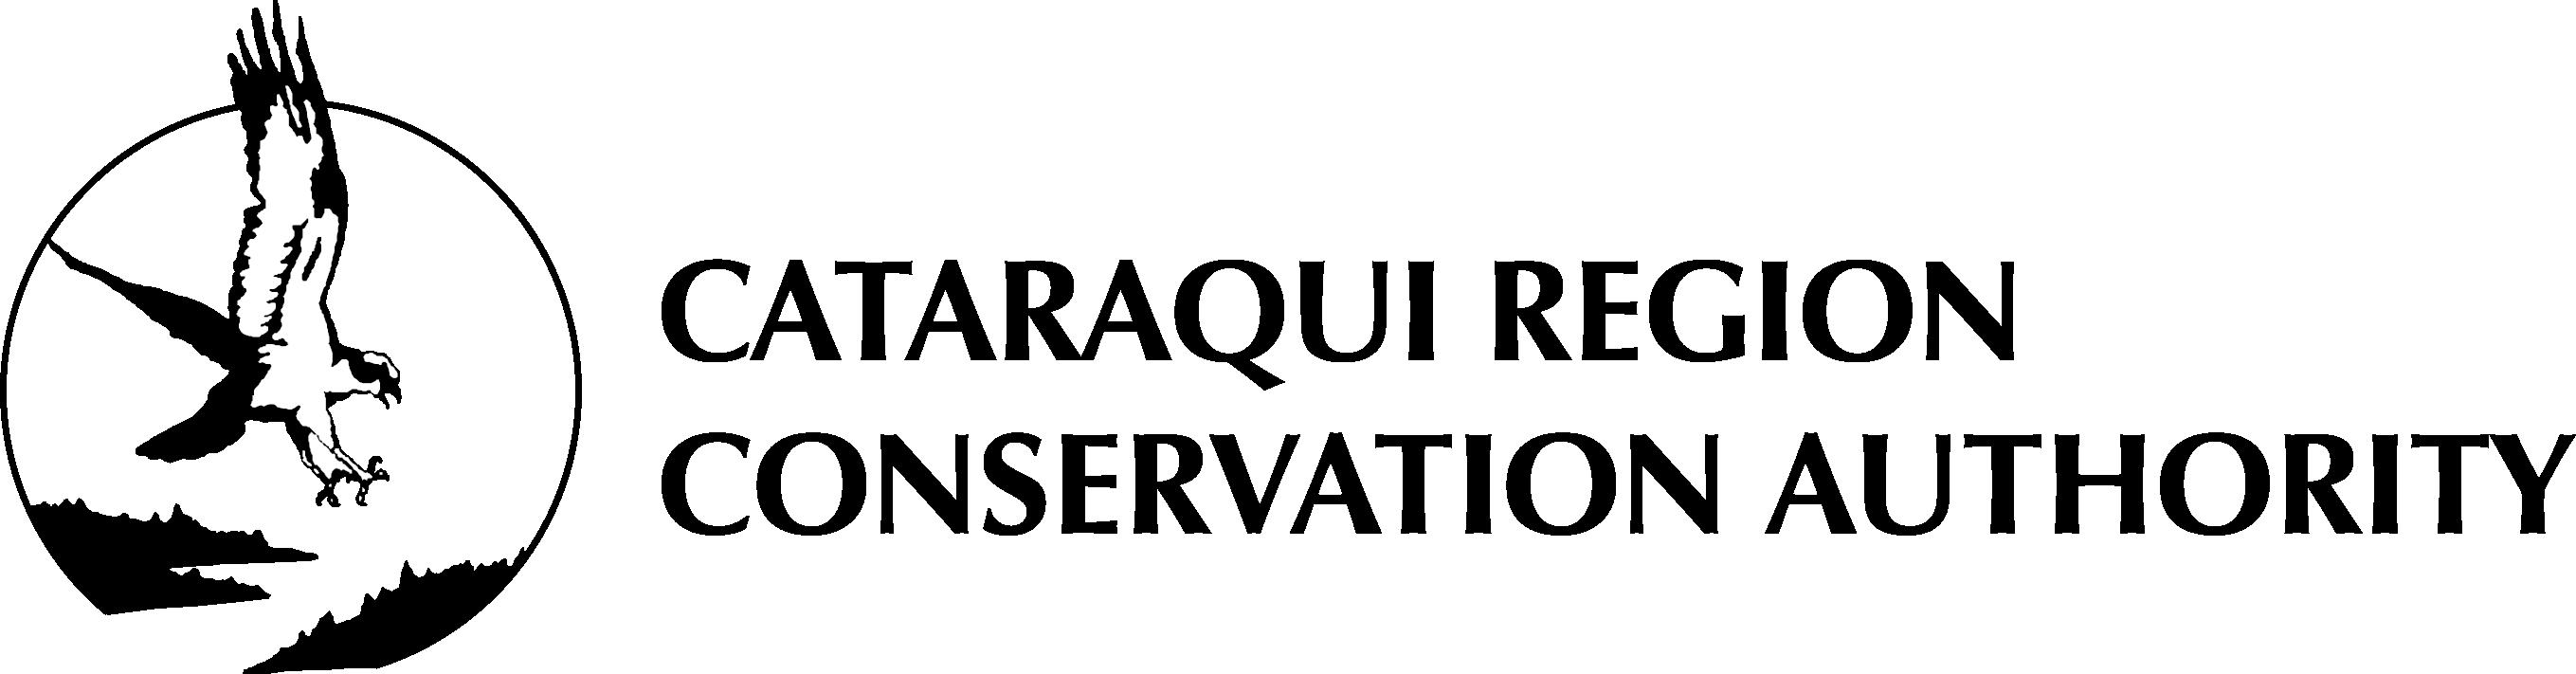 cataraqui region conservation authority logo